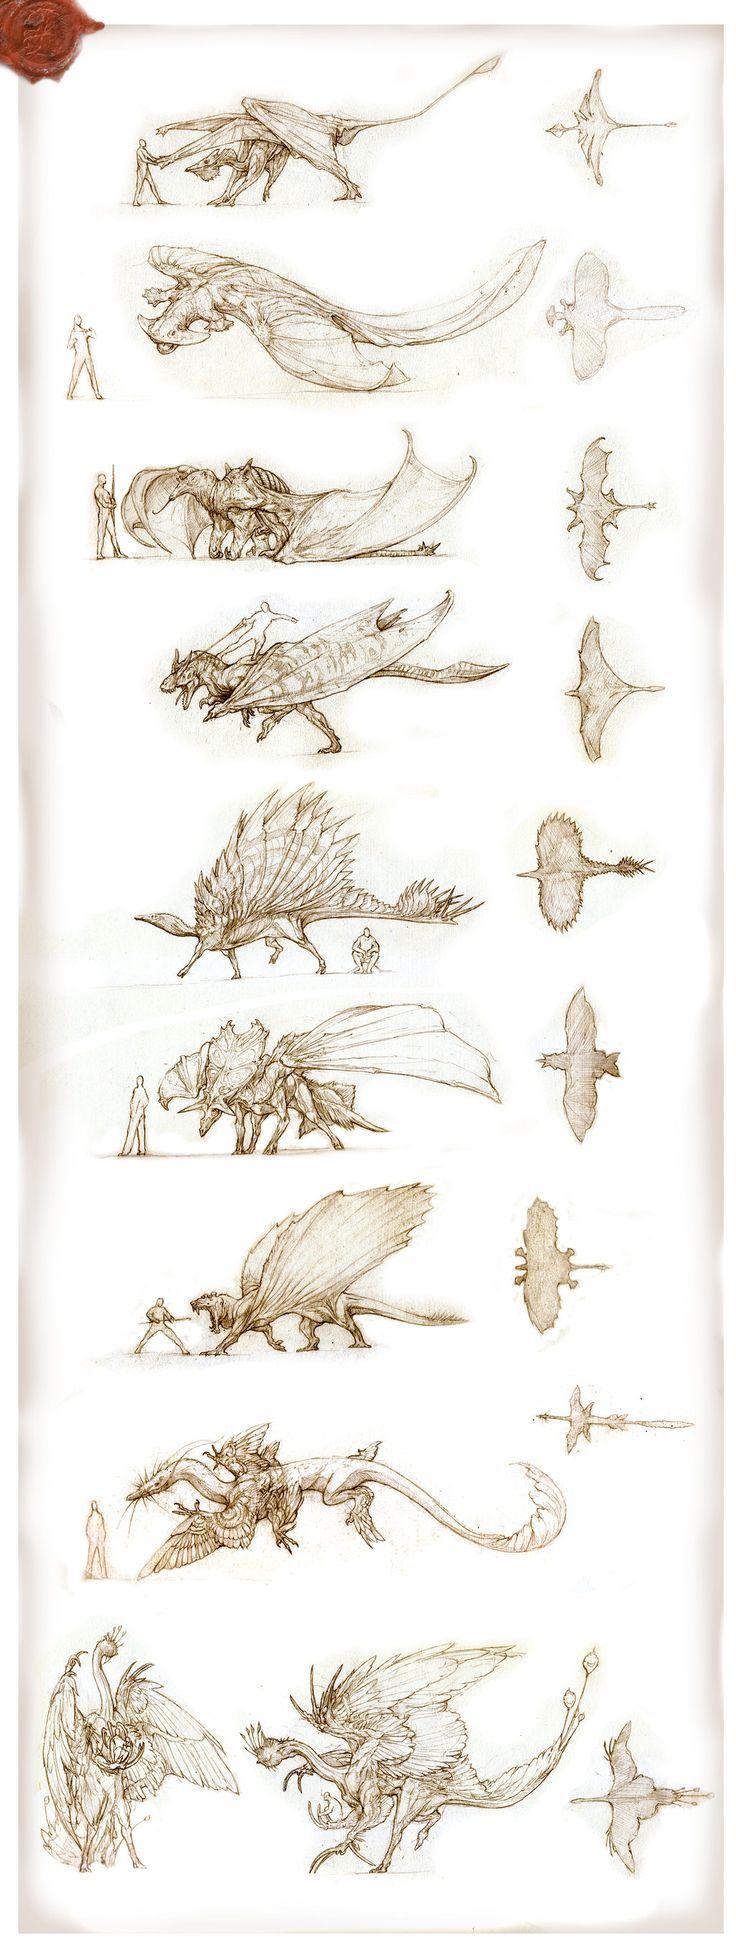 Dinosaurs as dragons!